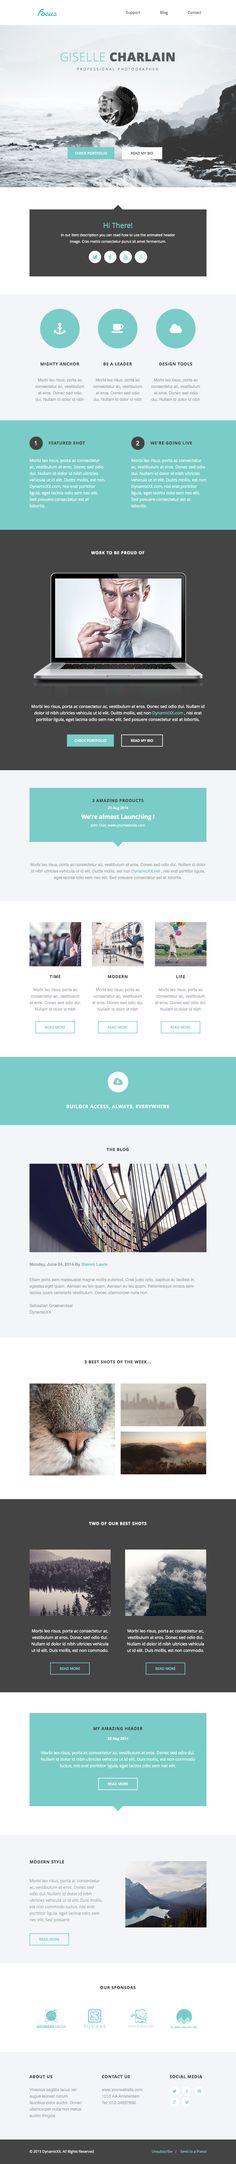 Clean & Modern Web Design                                                                                                                                                                                 More